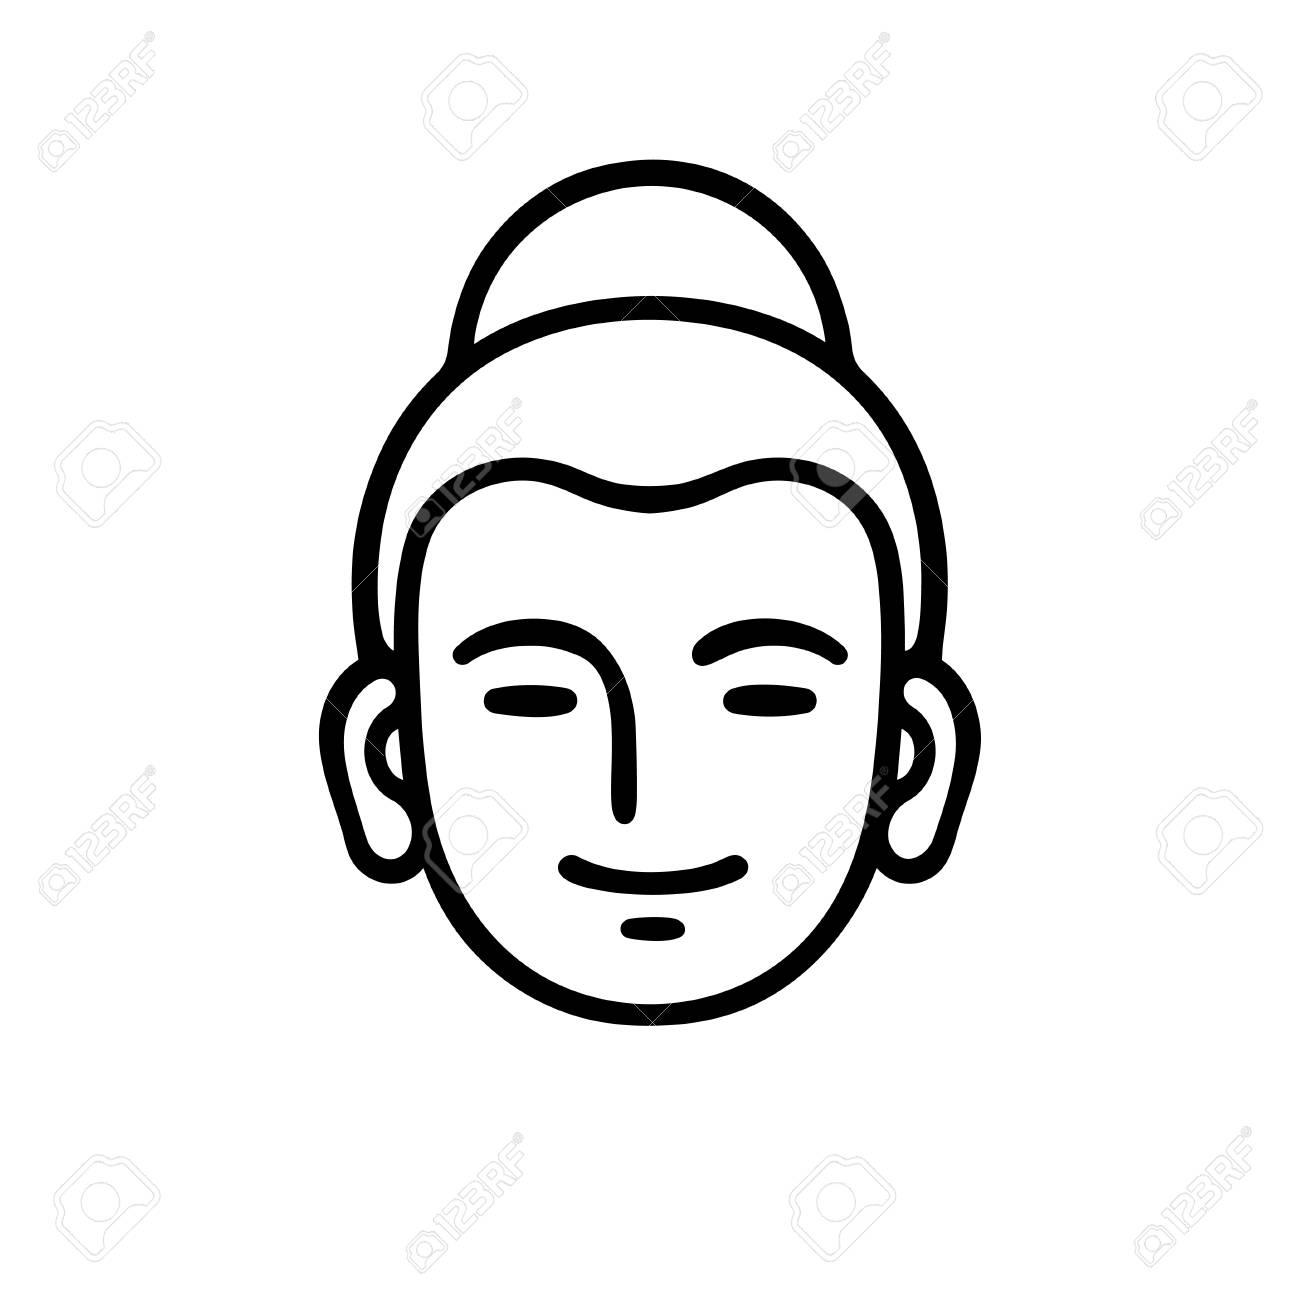 Simple Smiling Buddha Head Icon Or Logo Minimal Black And White